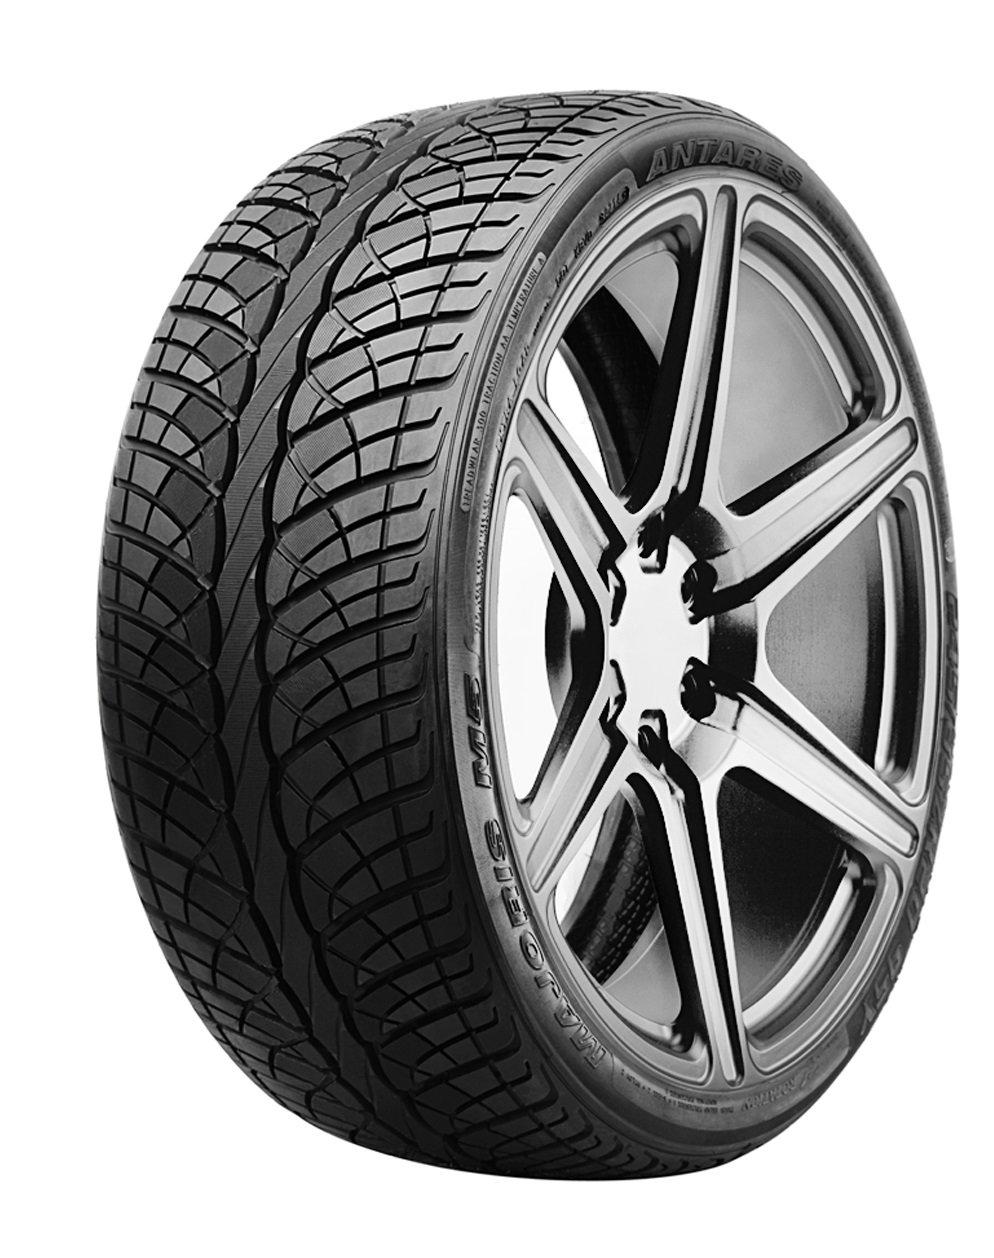 Antares MAJORIS M5 Performance Radial Tire - 255/45R20 105W by Antares (Image #1)